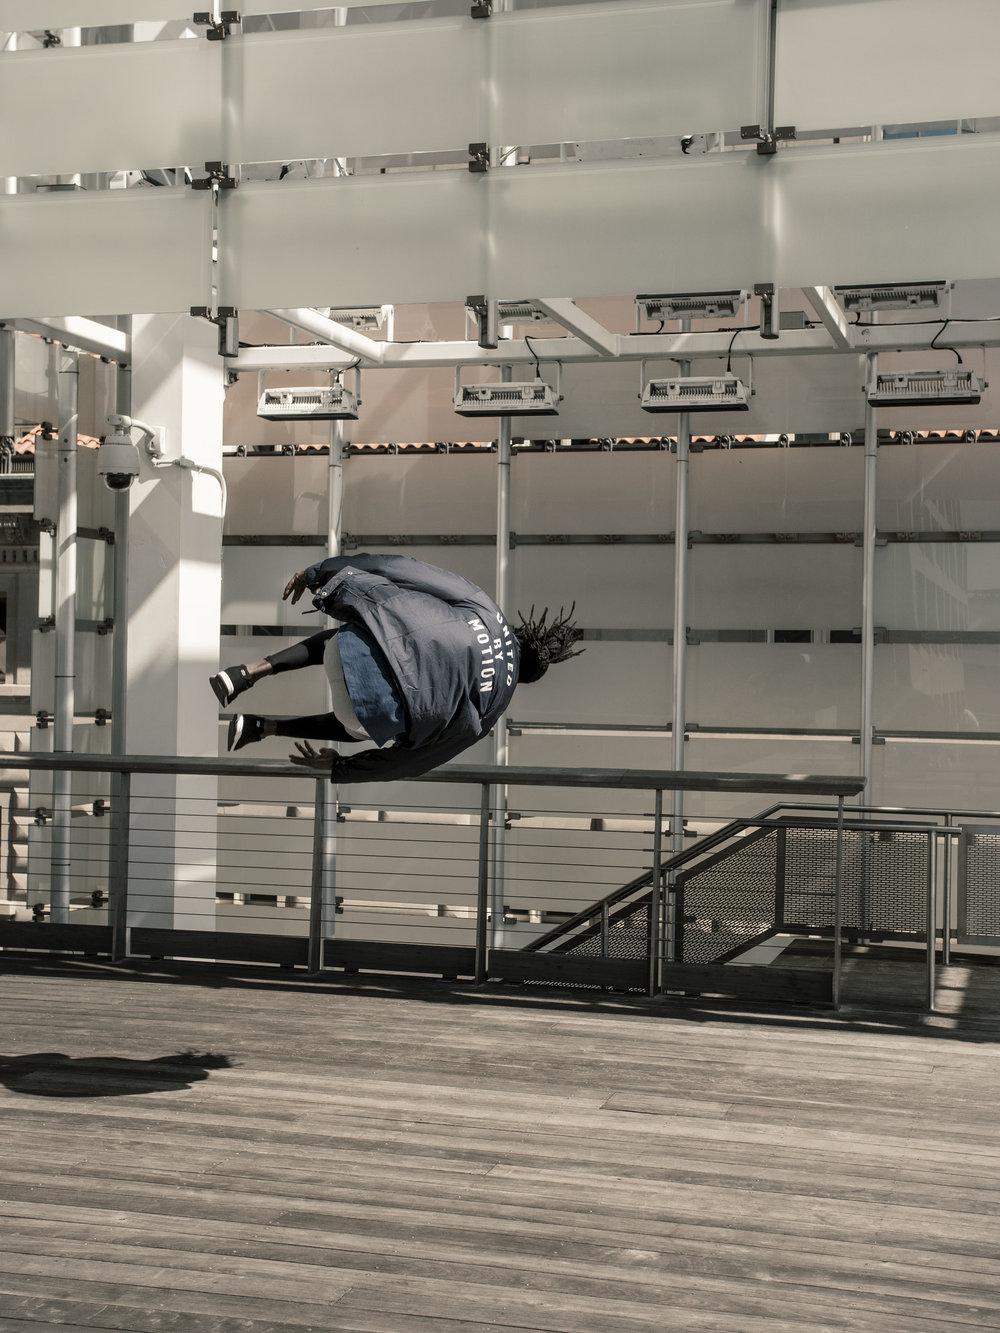 Sha-Mualimm-Ak-Parkour-Sideflip-Flip-Strike-MVMNT-NYC-Manhattan-Steve-Zavitz-Freerunning